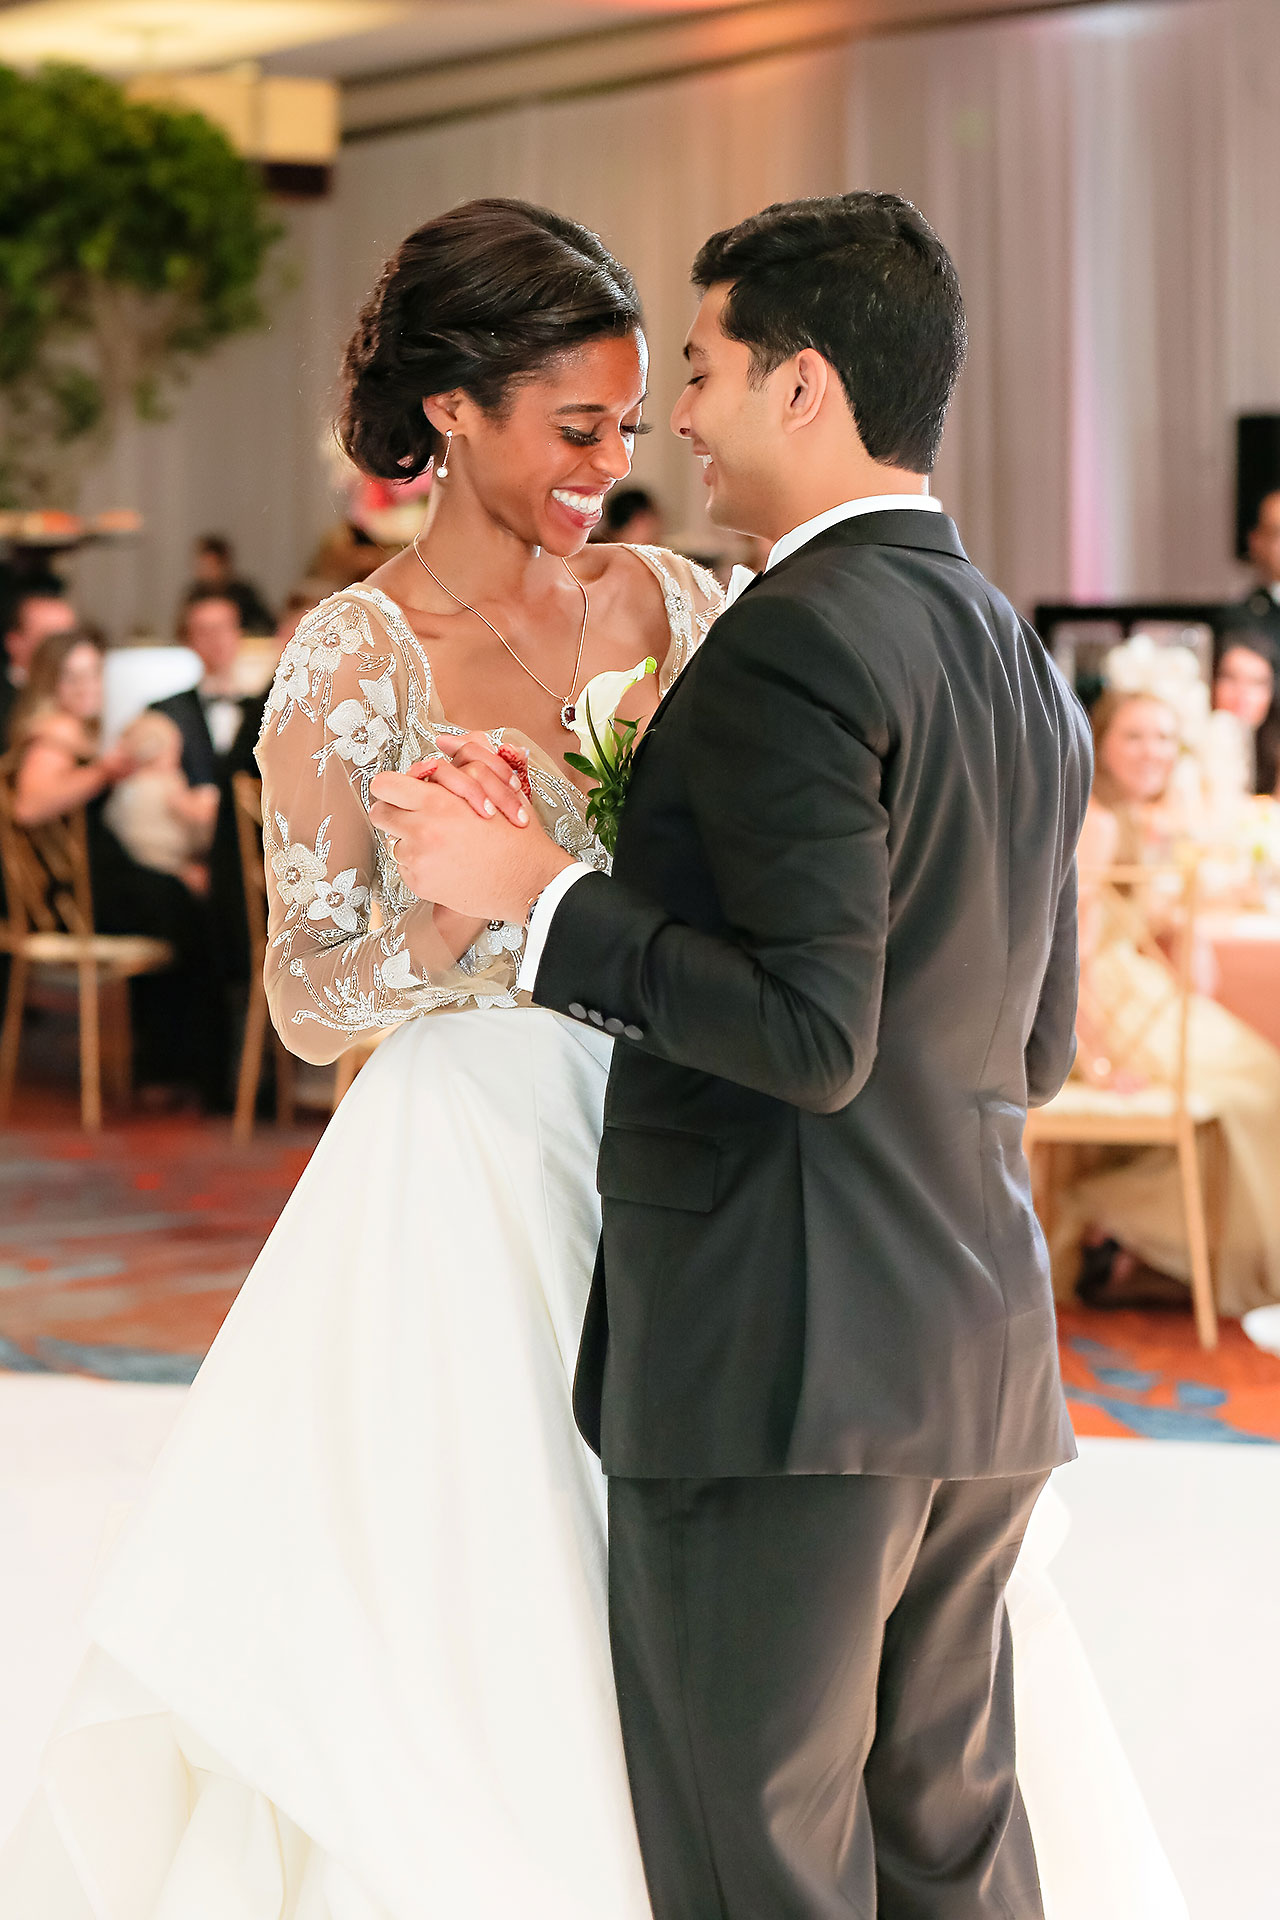 Joie Nikhil JW Marriott Indianapolis Wedding 116